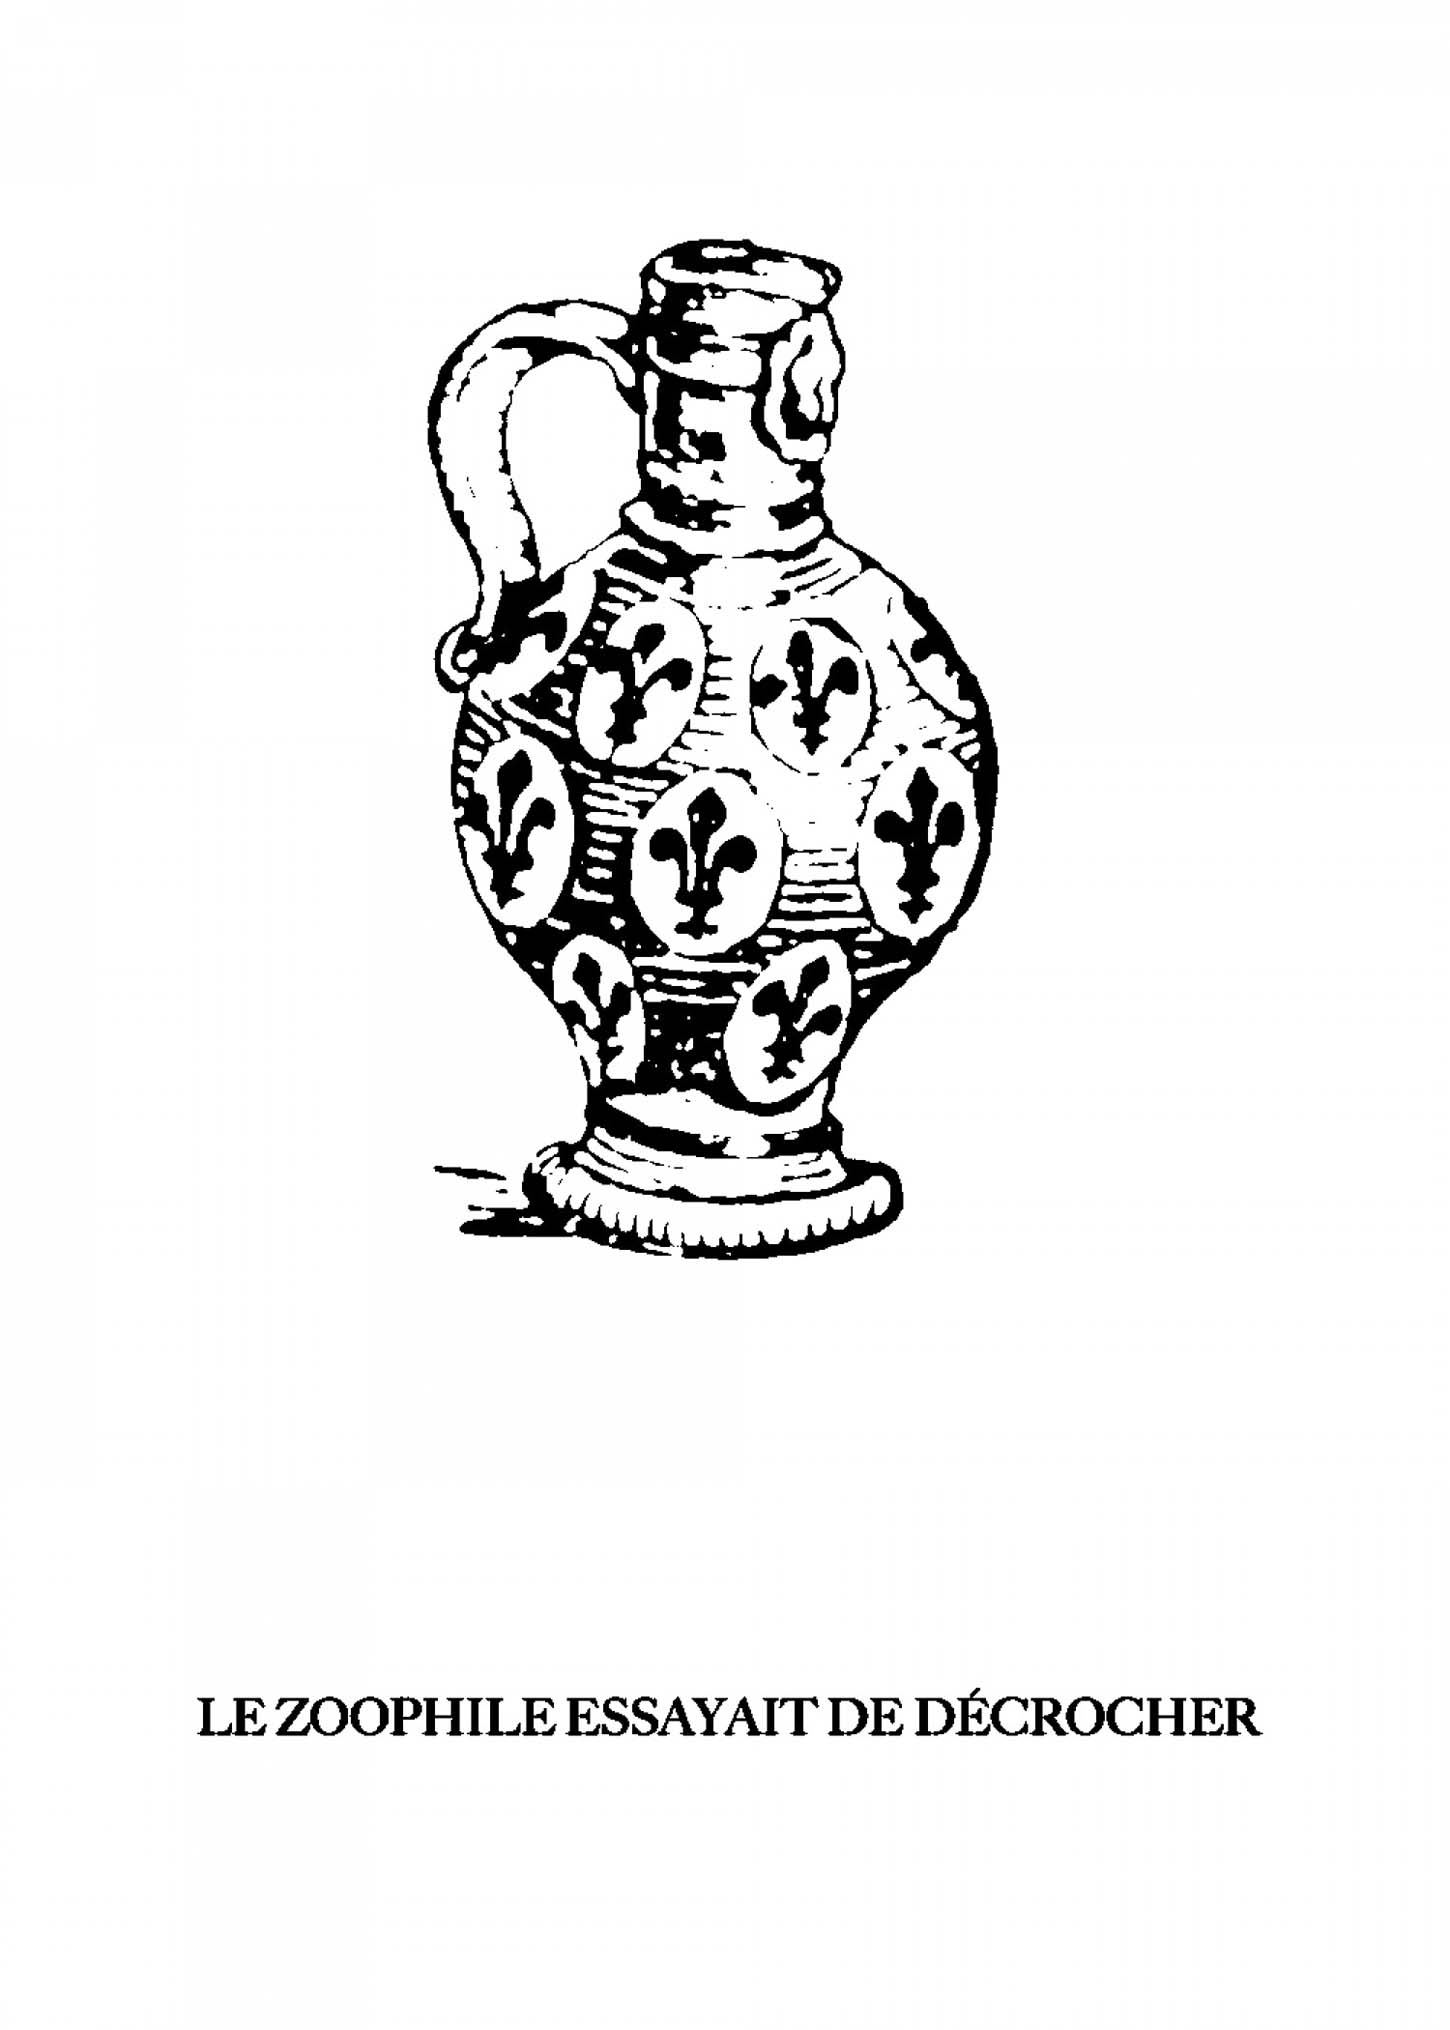 Gerald Panighi, Sérigraphie, 70x50cm, 50 ex/brut de Centaure 300g. Disponible